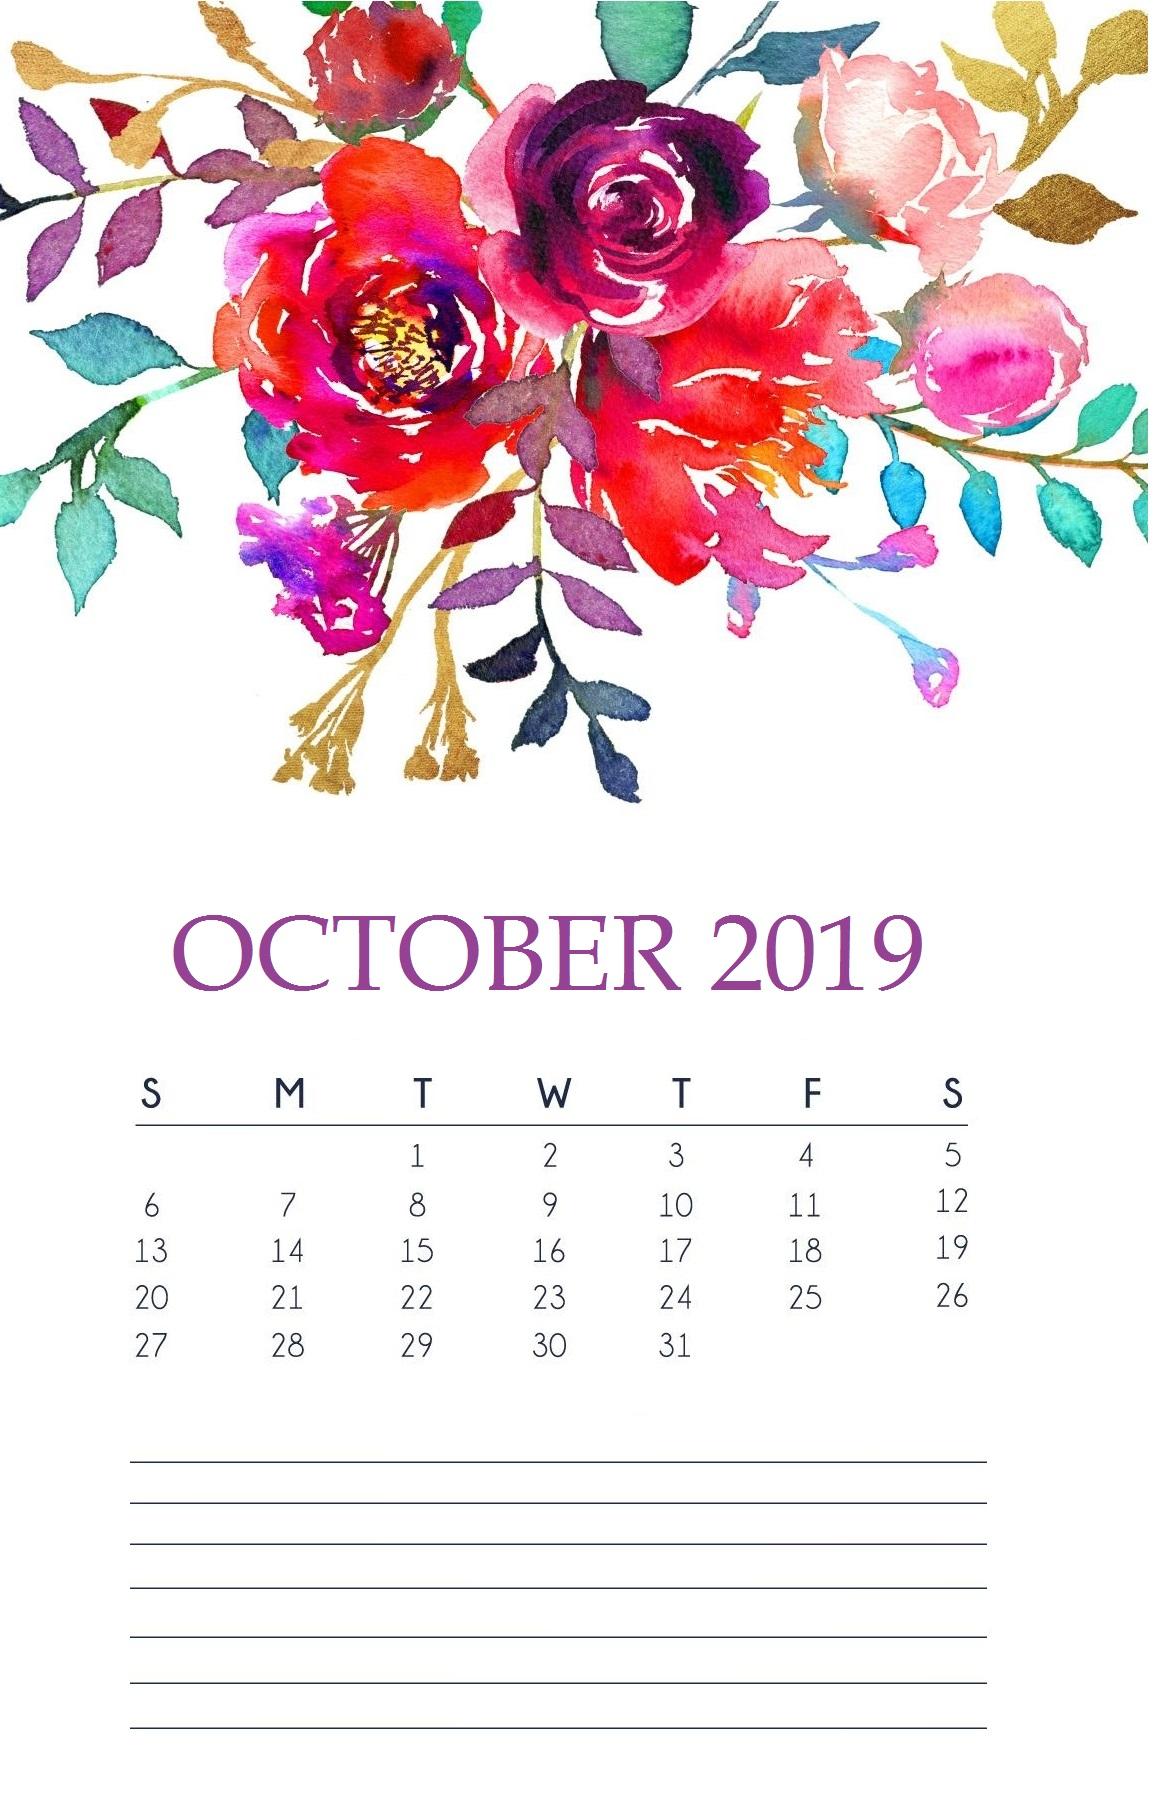 October 2019 Floral Wall Calendar